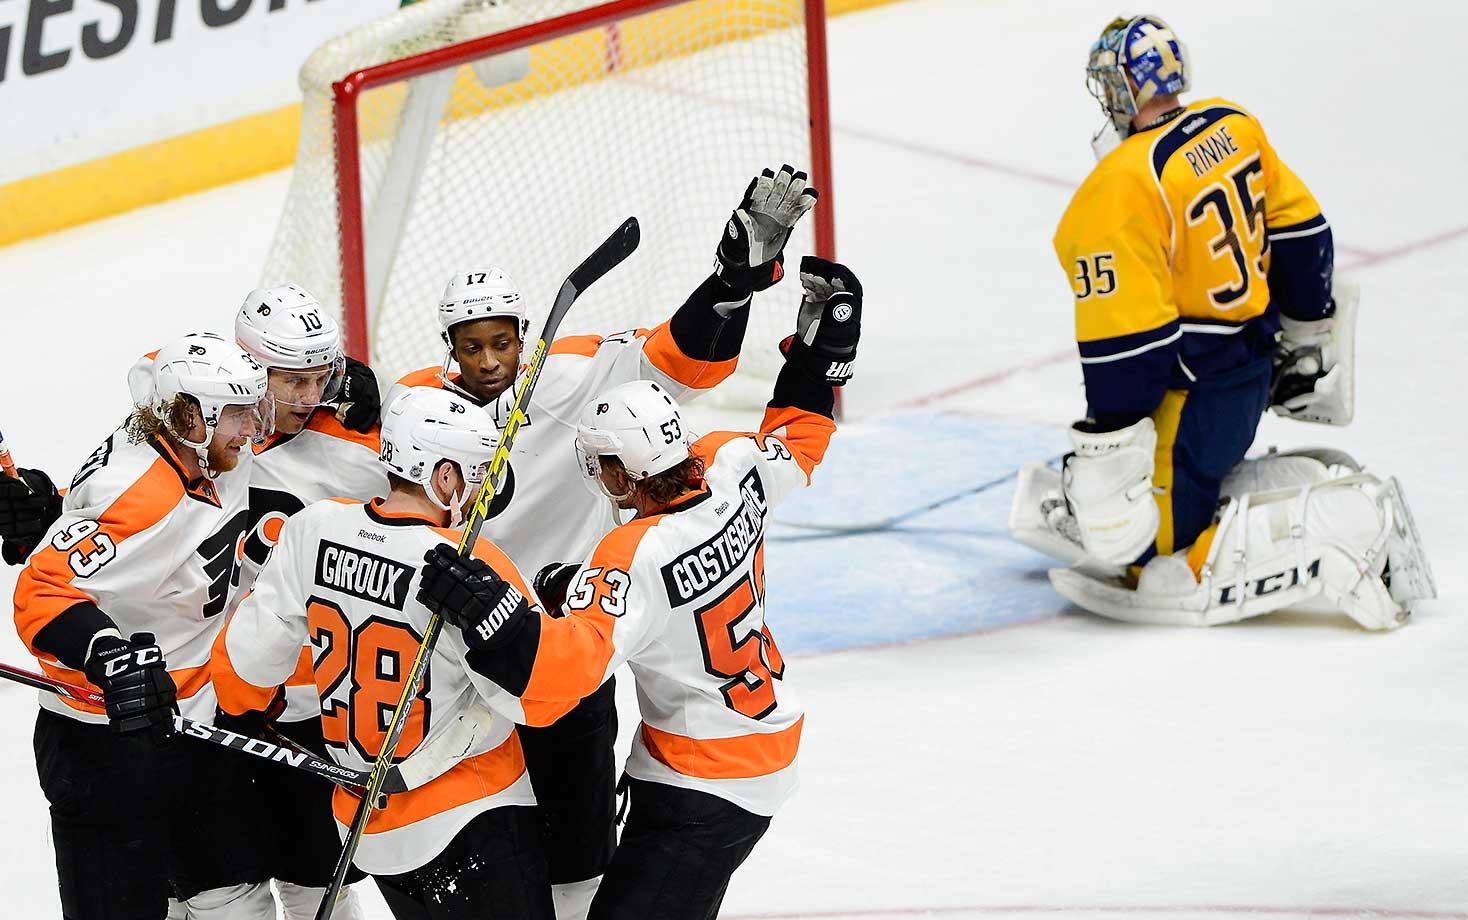 Philadelphia Flyers right wing Wayne Simmonds (17) celebrates with Brayden Schenn (10), Jakub Voracek (93), Claude Giroux (28) and Shayne Gostisbehere (53) after scoring a goal against Nashville Predators goalie Pekka Rinne in Nashville. The Flyers won 6-3.